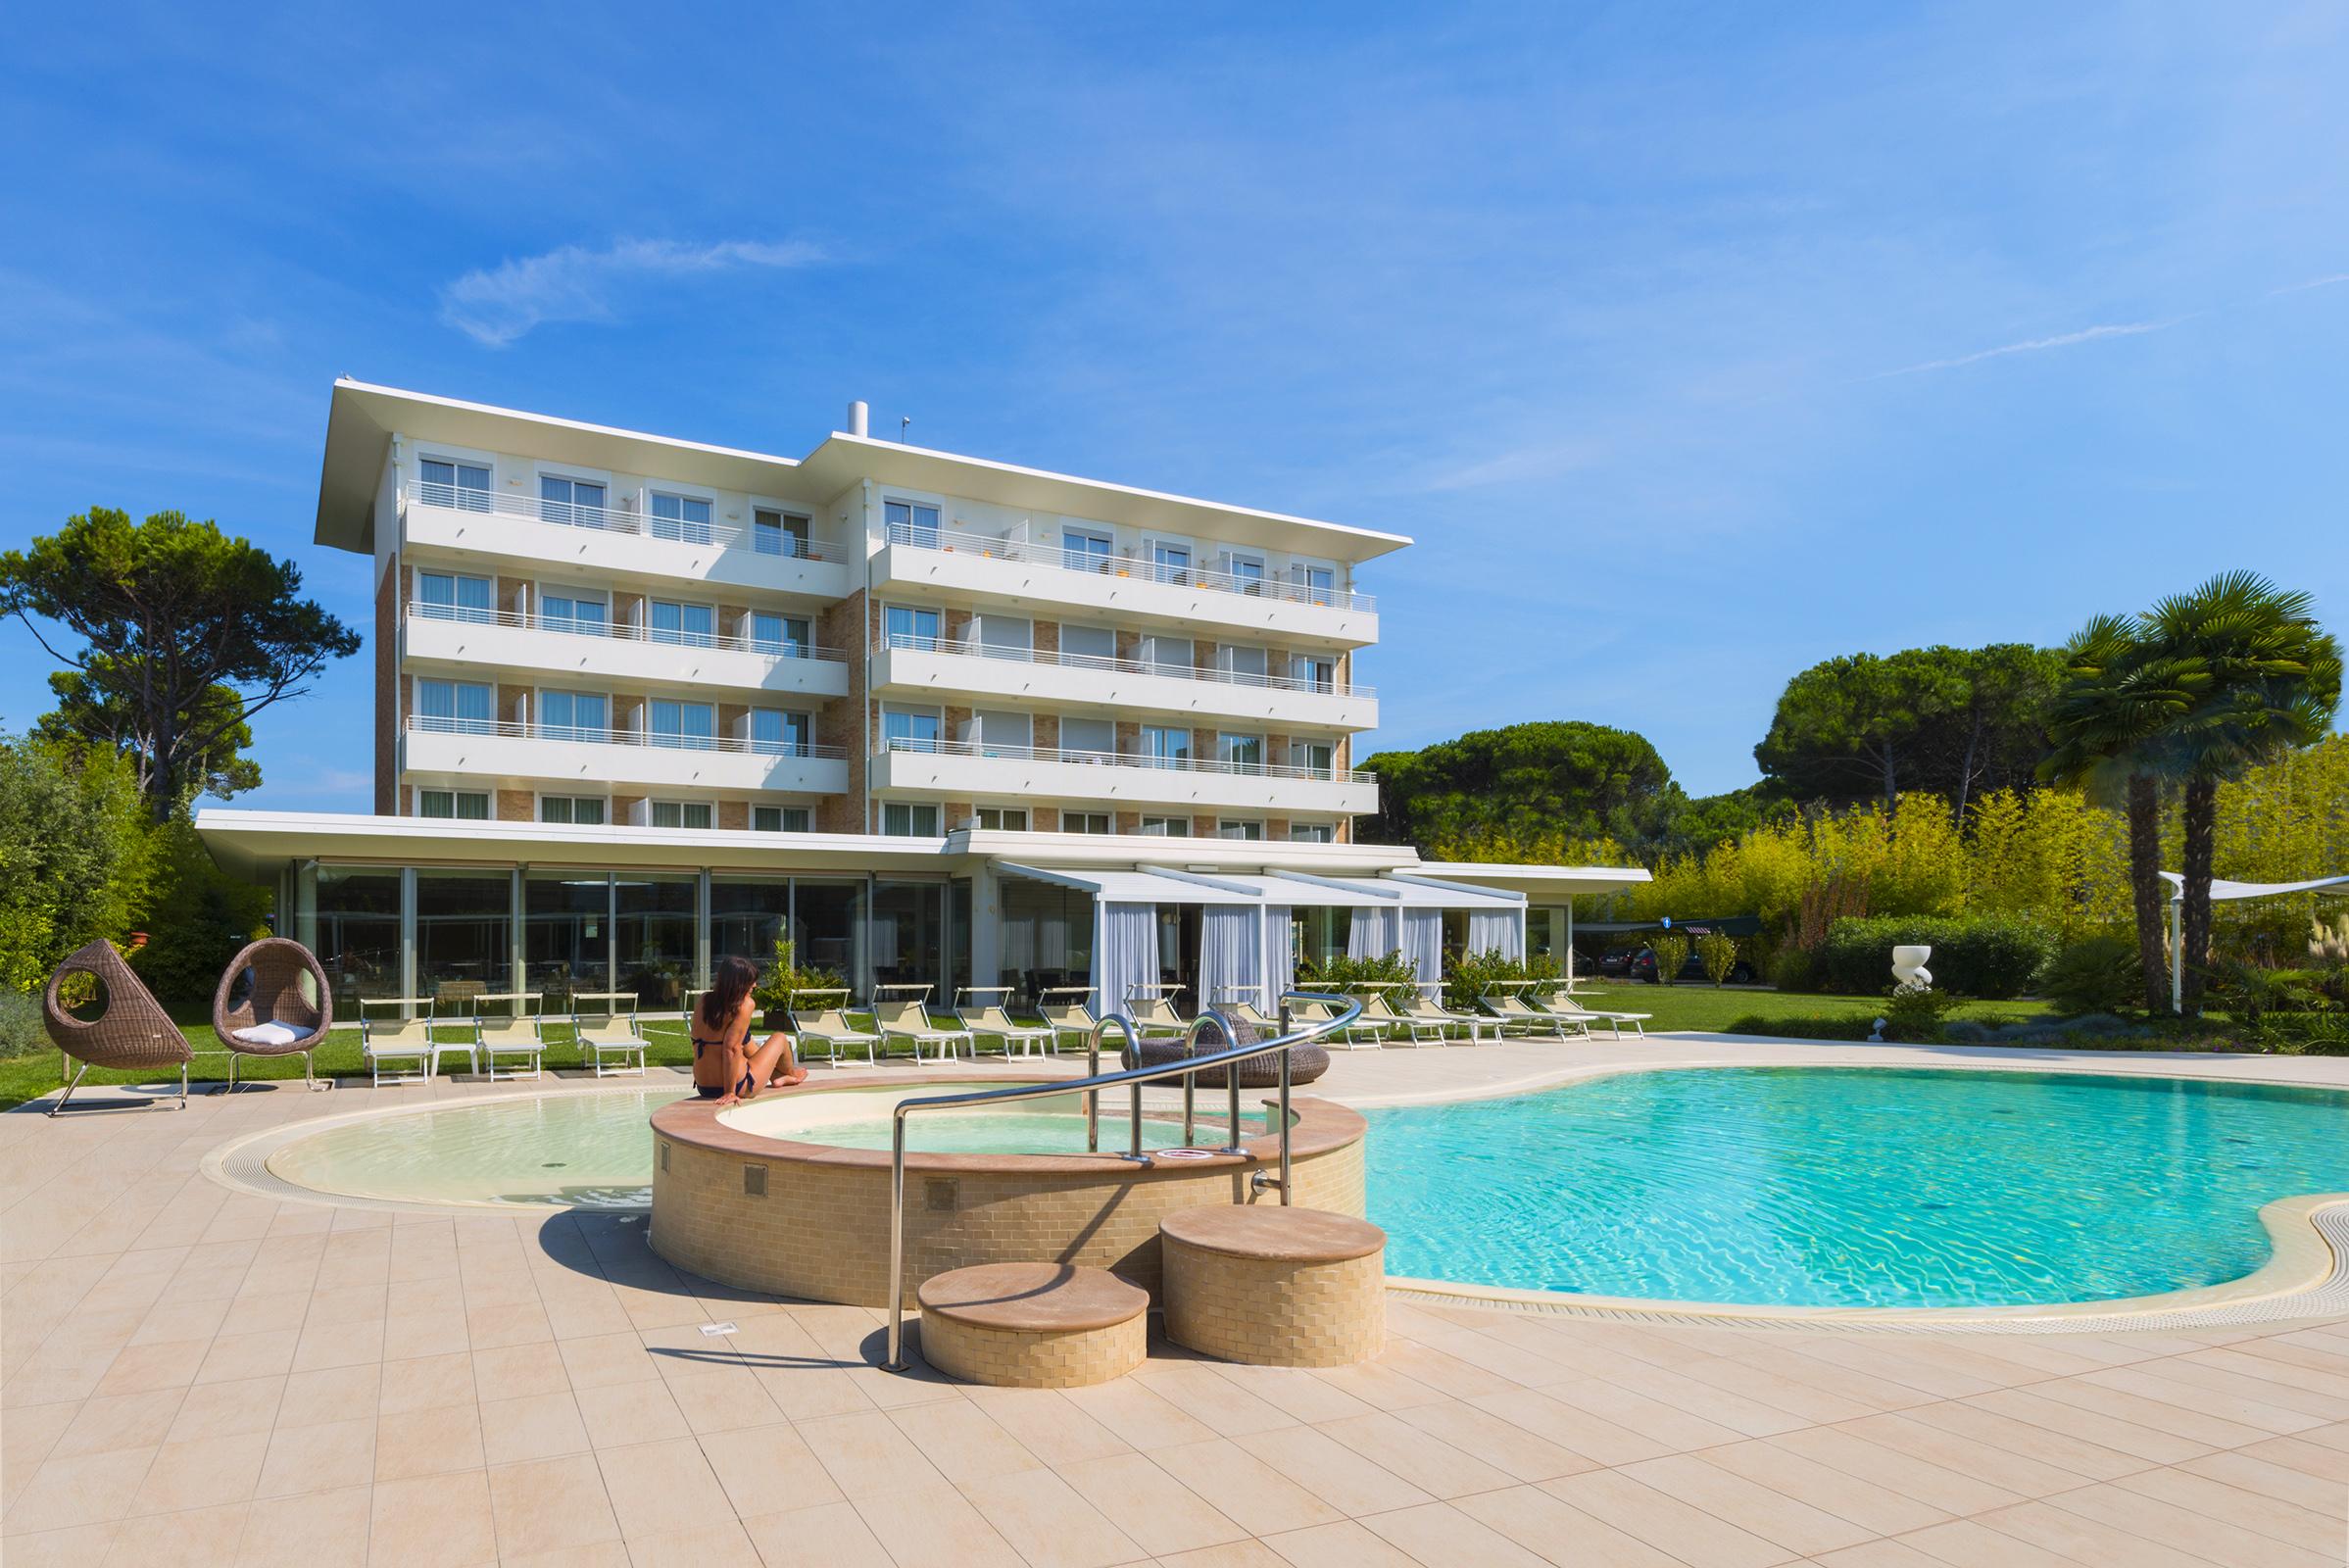 Hotel San Marco Bibione Bewertung